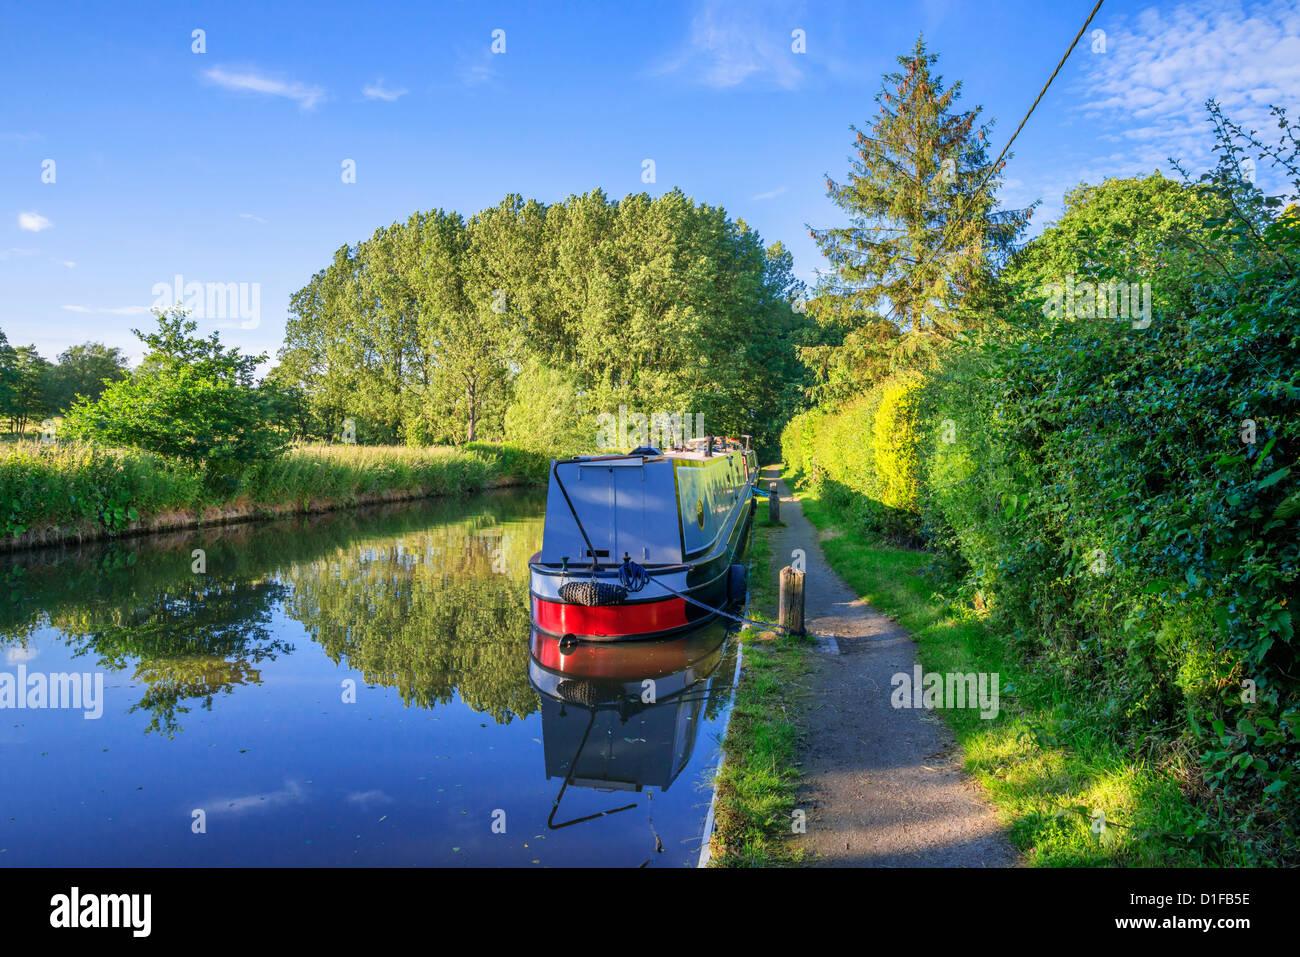 A narrow boat on the Stratford upon Avon canal, Preston Bagot flight of locks, Warwickshire, Midlands, England, - Stock Image